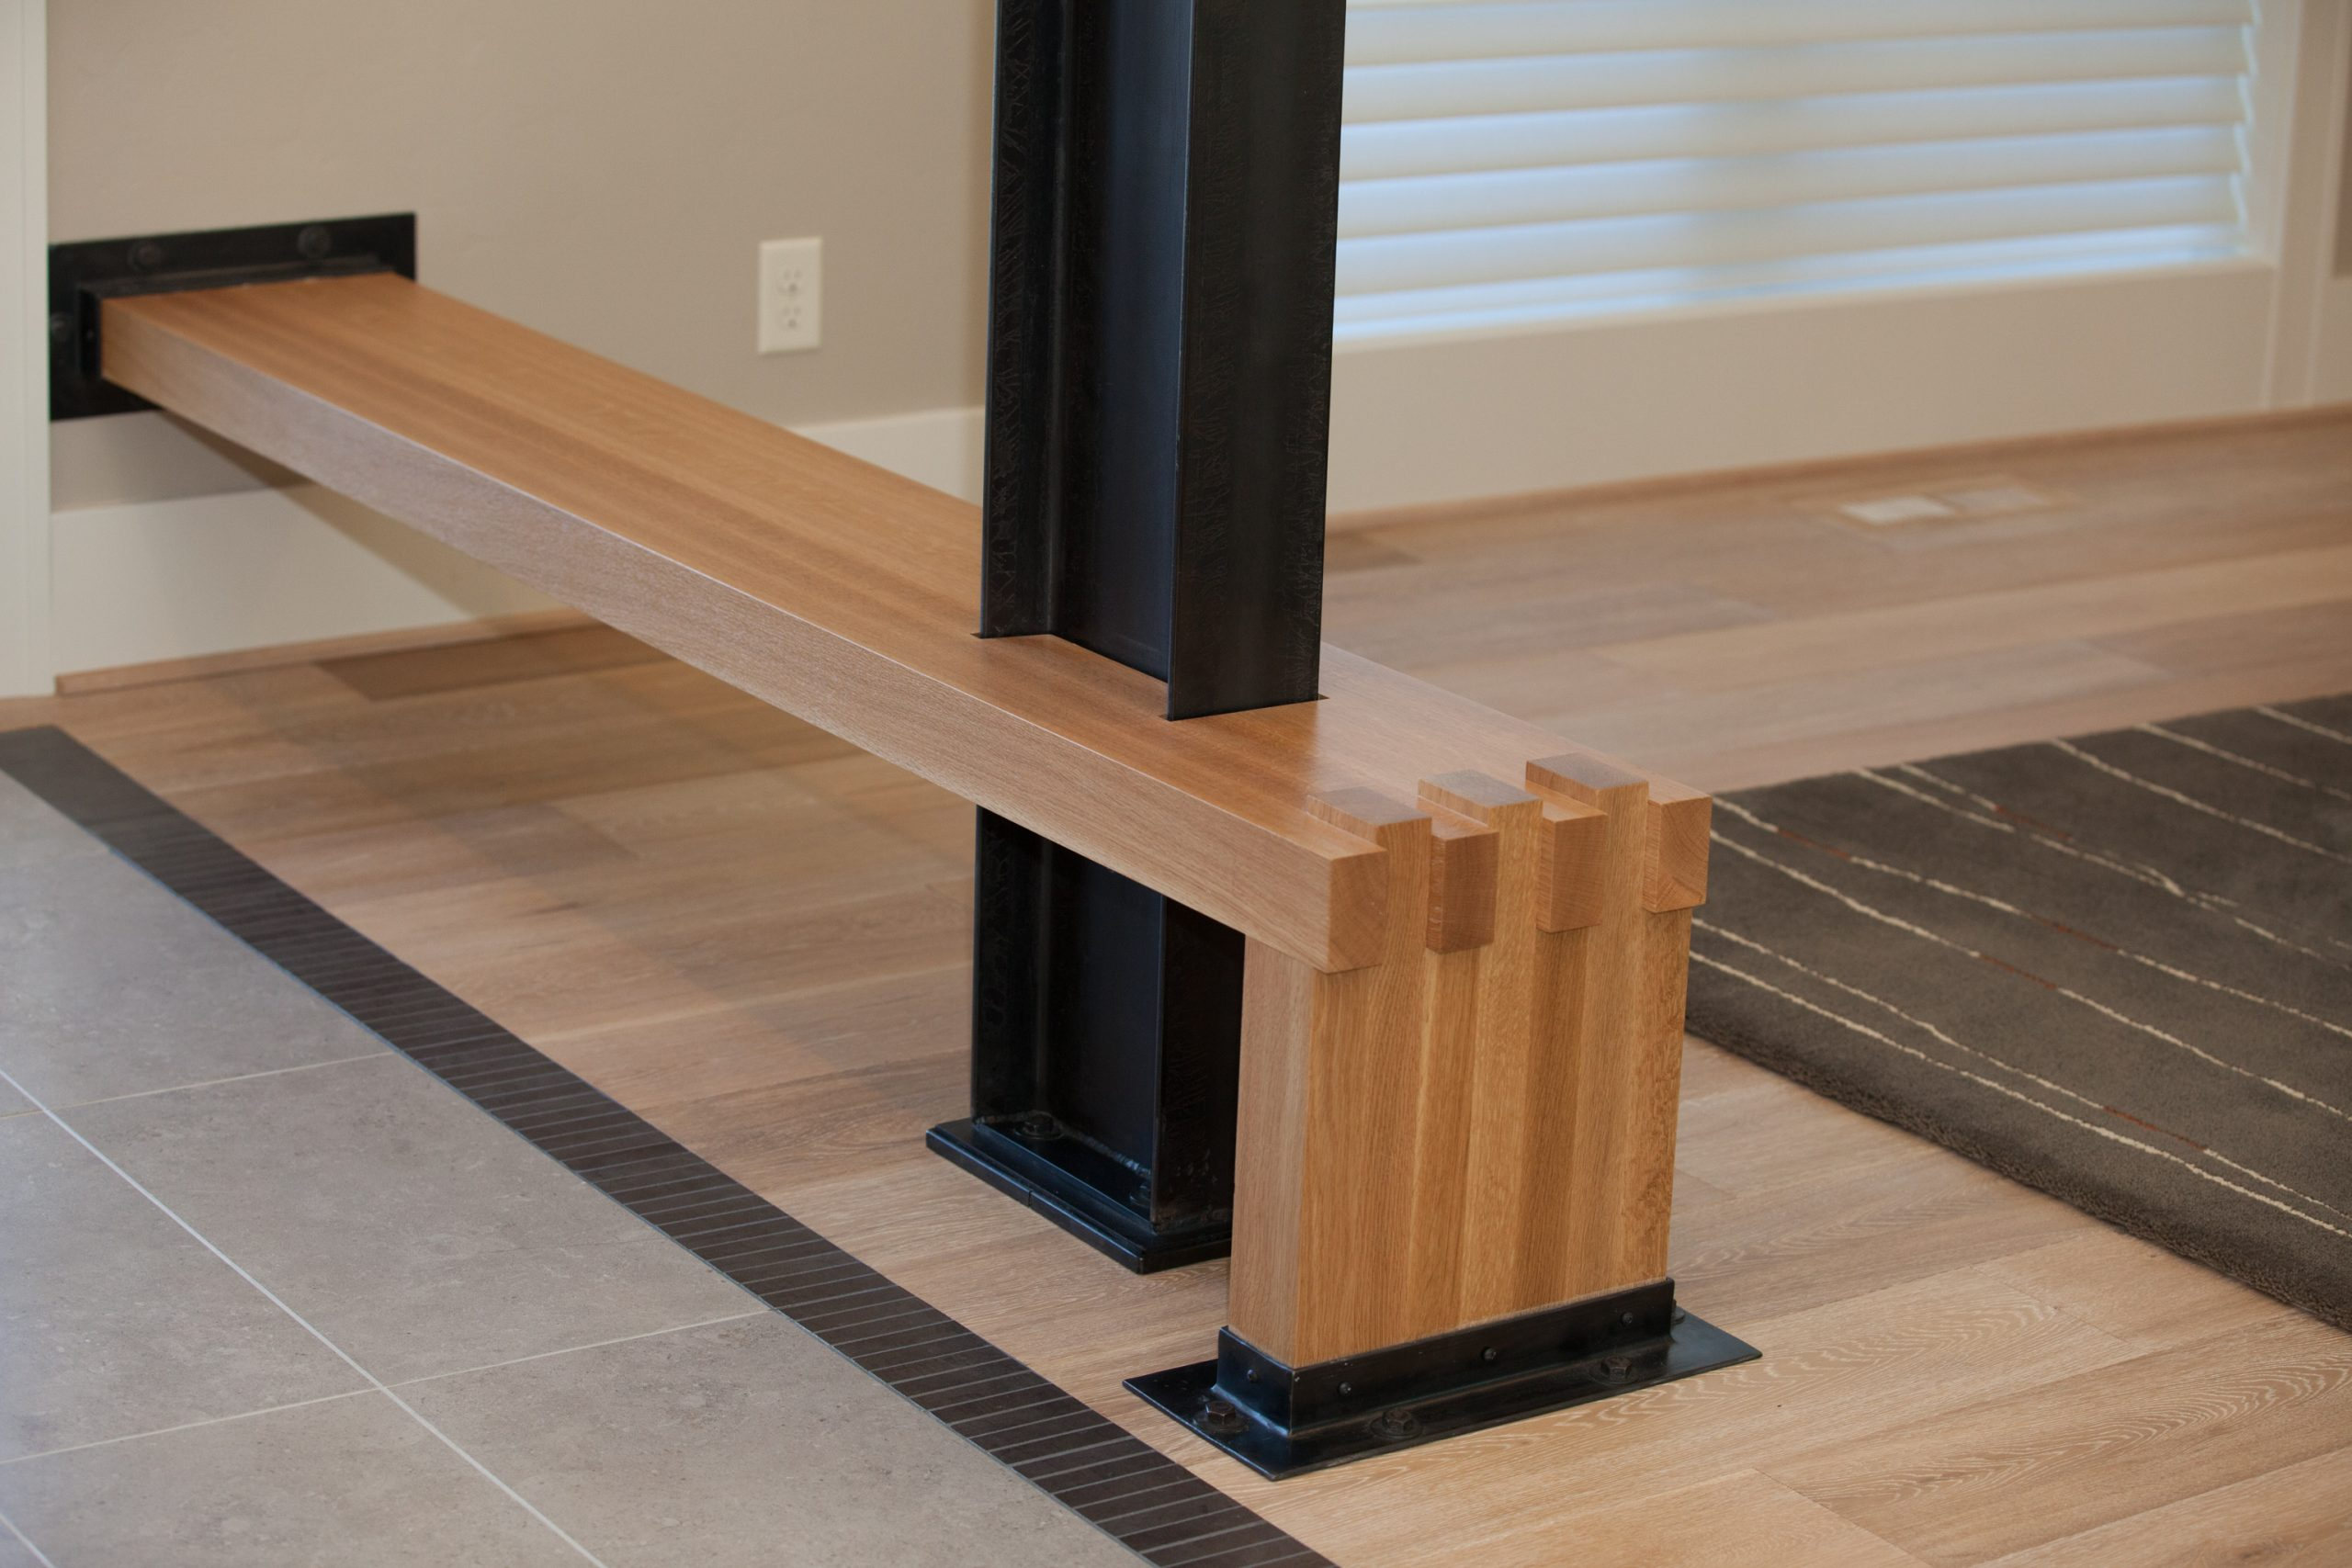 mw design workshop custom bench